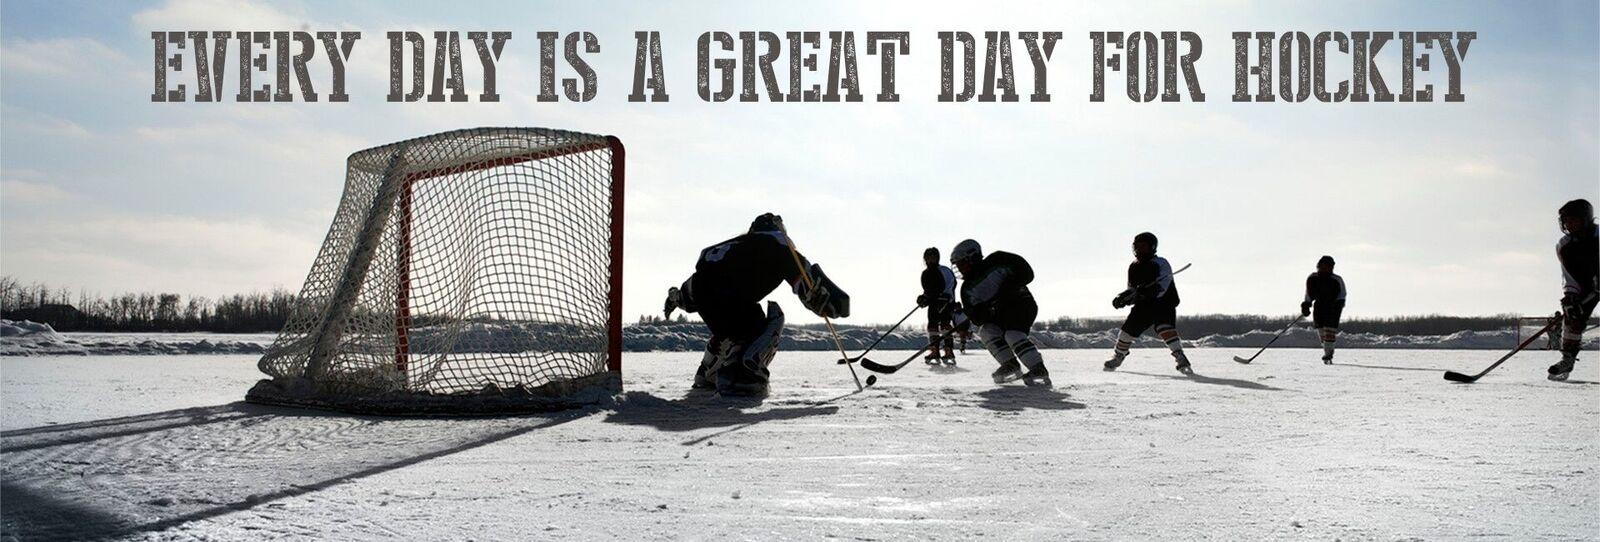 hokejam_eishockey